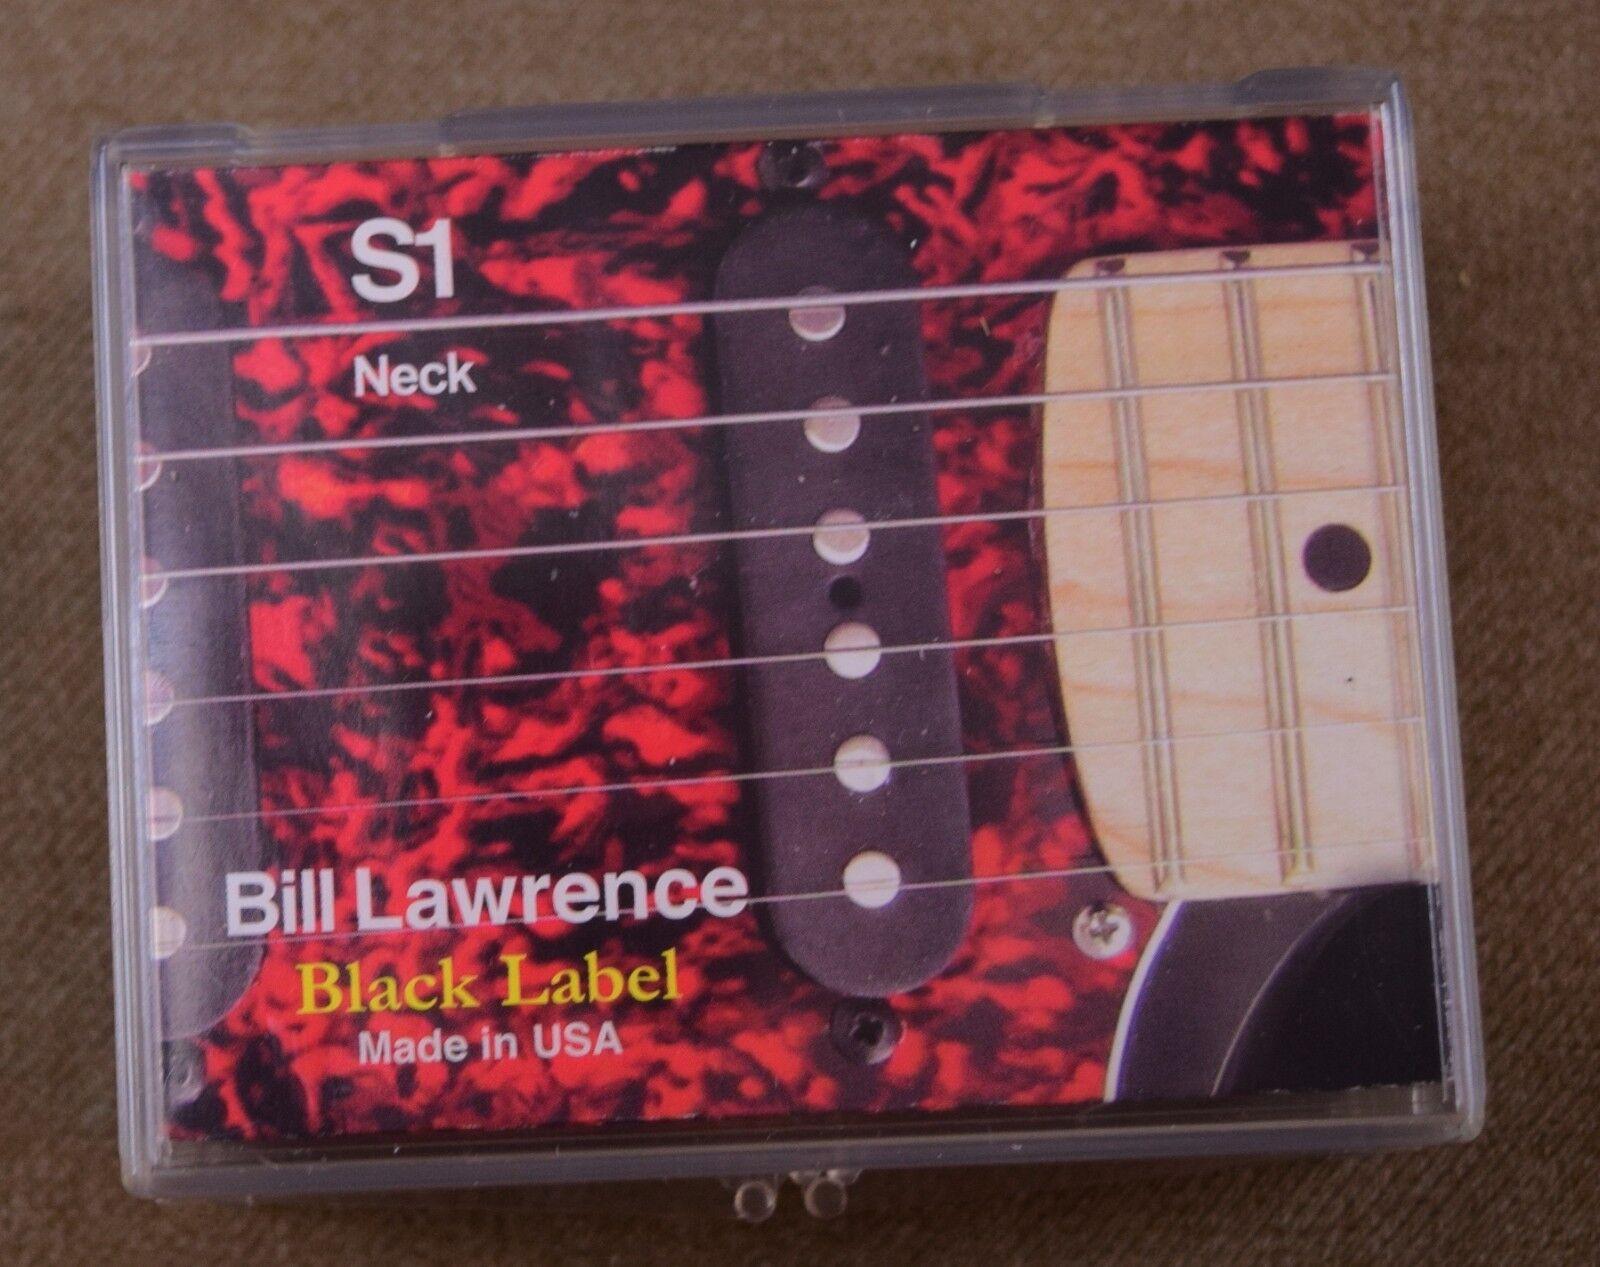 Bill Lawrence schwarz Label Set of Strat Type Pickups (S-1, S-2, S-3)